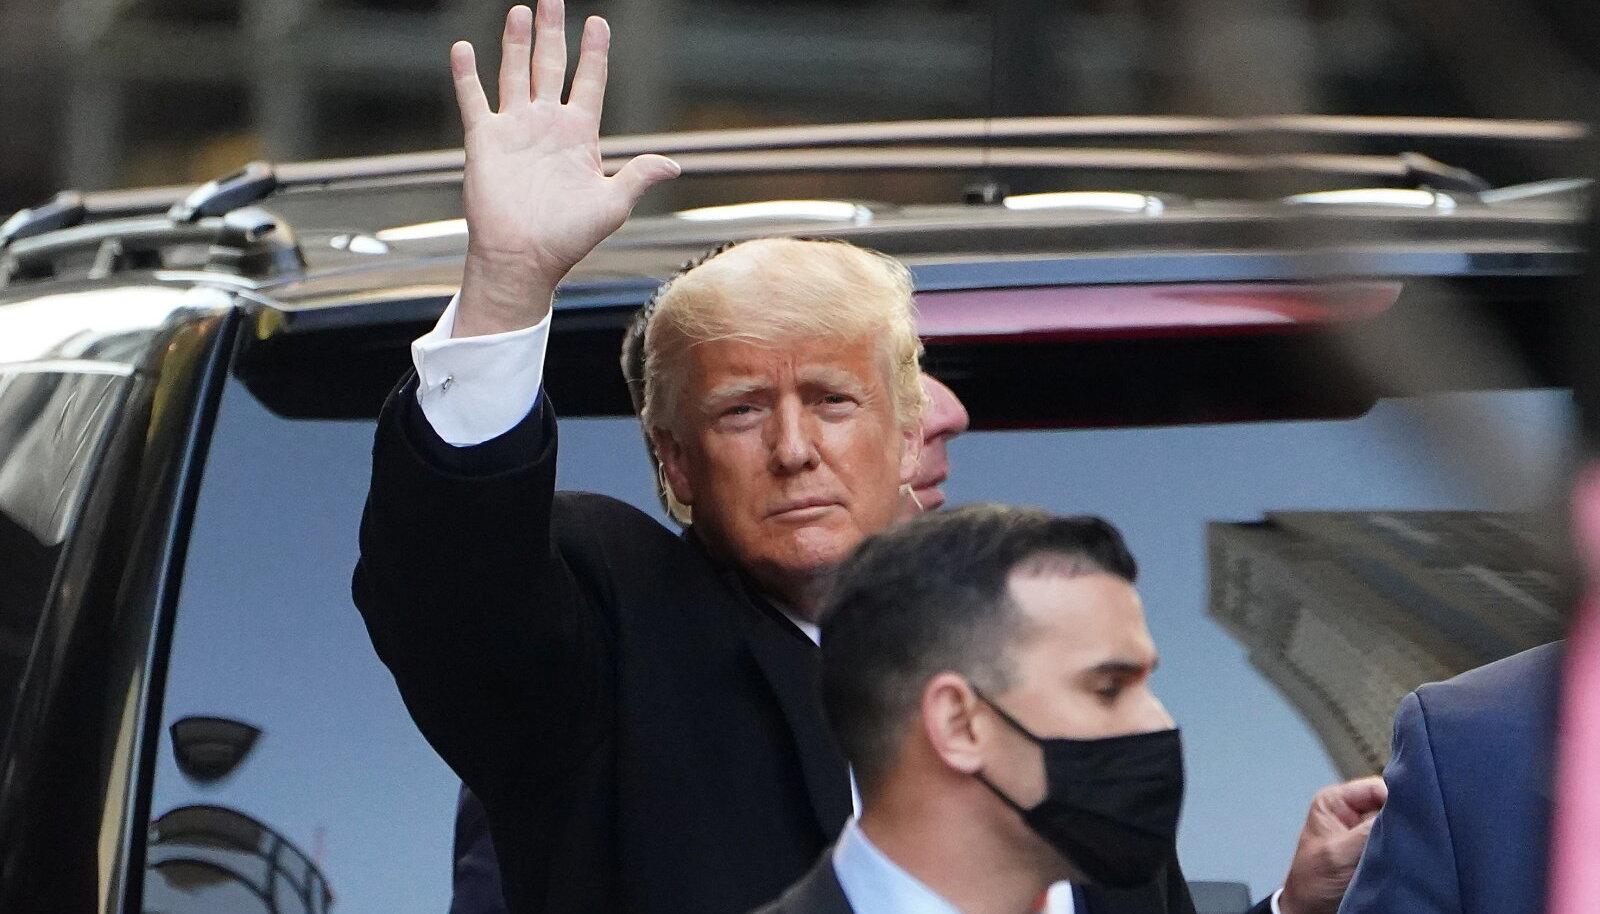 USA endine president Donald Trump